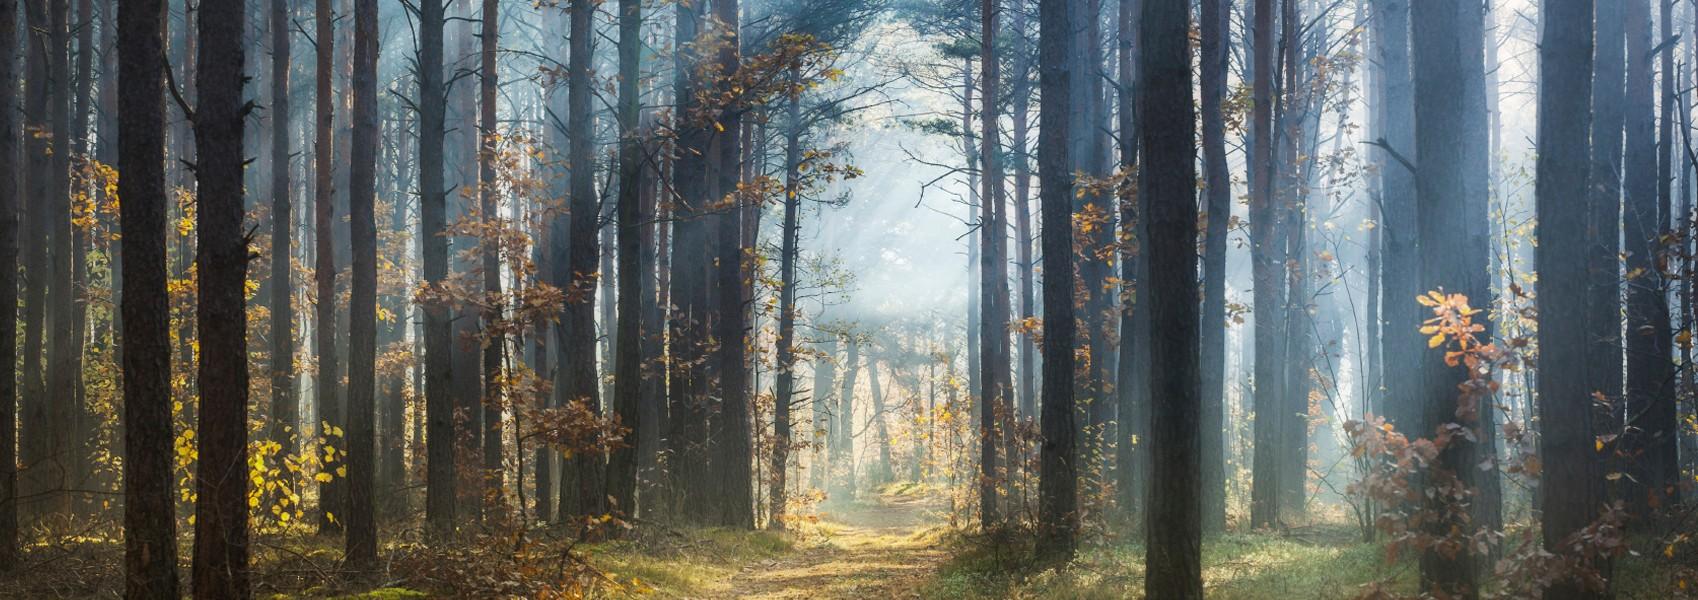 banner-tree